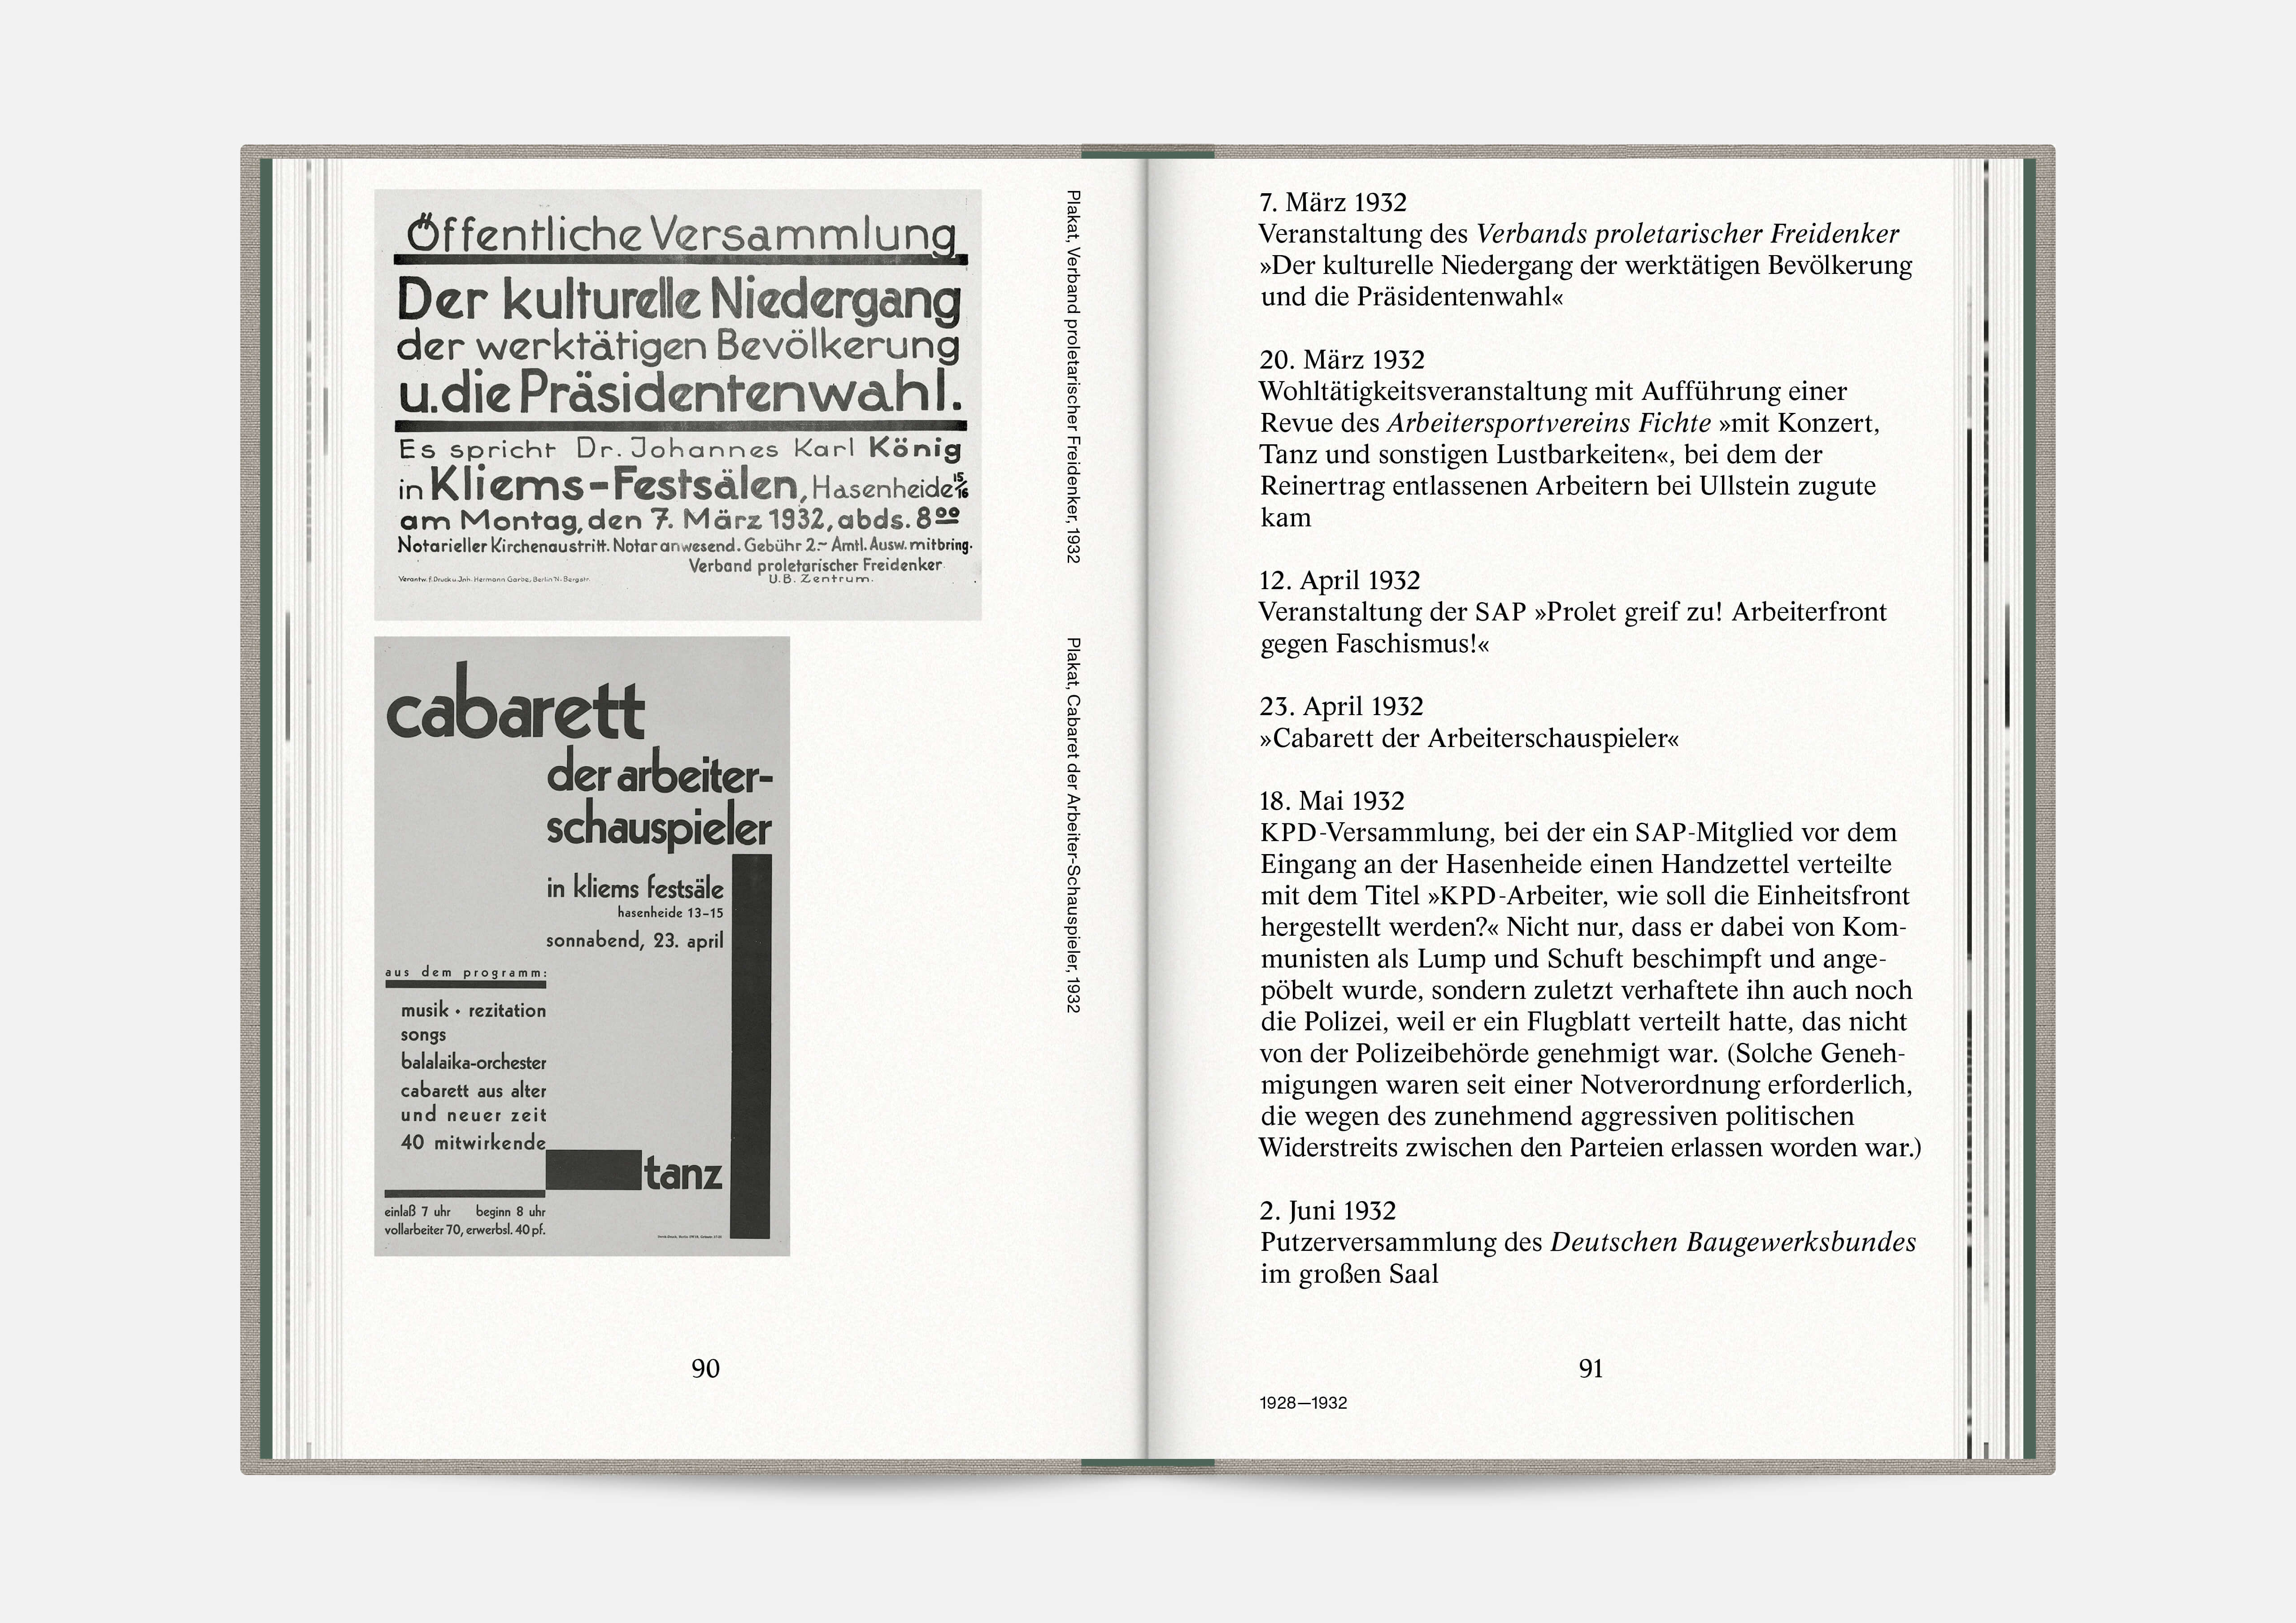 https://neuegestaltung.de/media/pages/clients/sammlung-wemhoner-hasenheide-13/a59afa3928-1628761381/sw-hasenheide_16.jpg